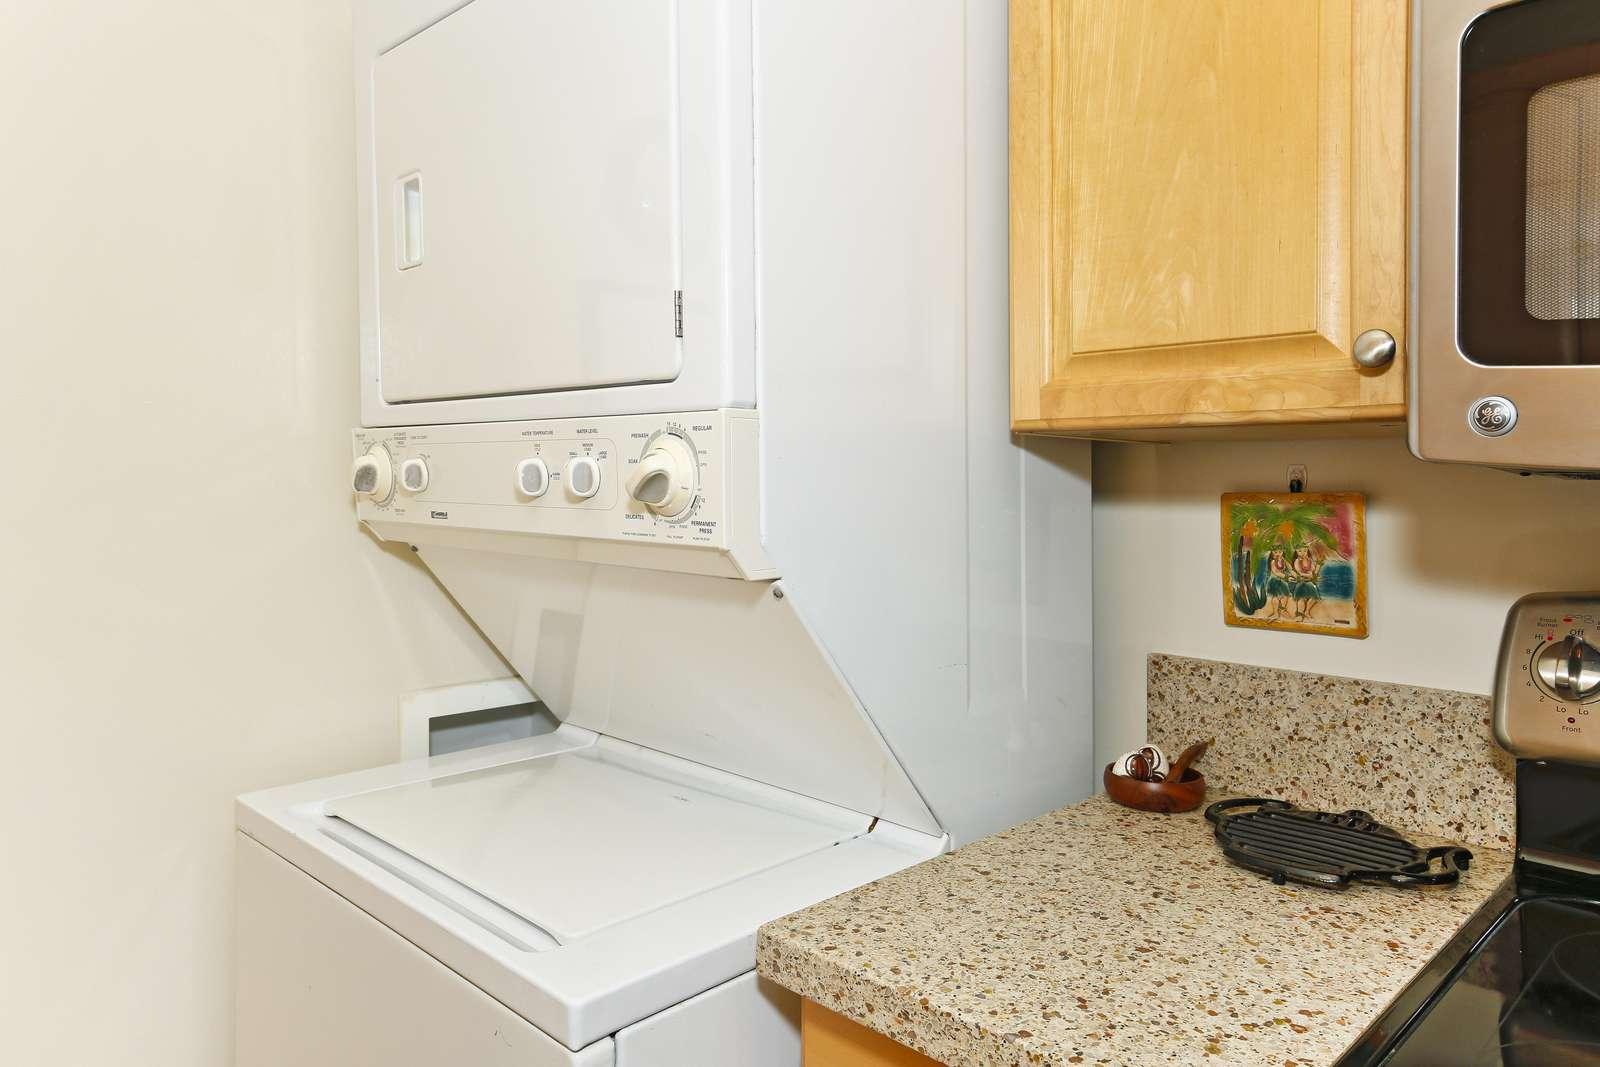 Laundry  - Washer & dryer in kitchen